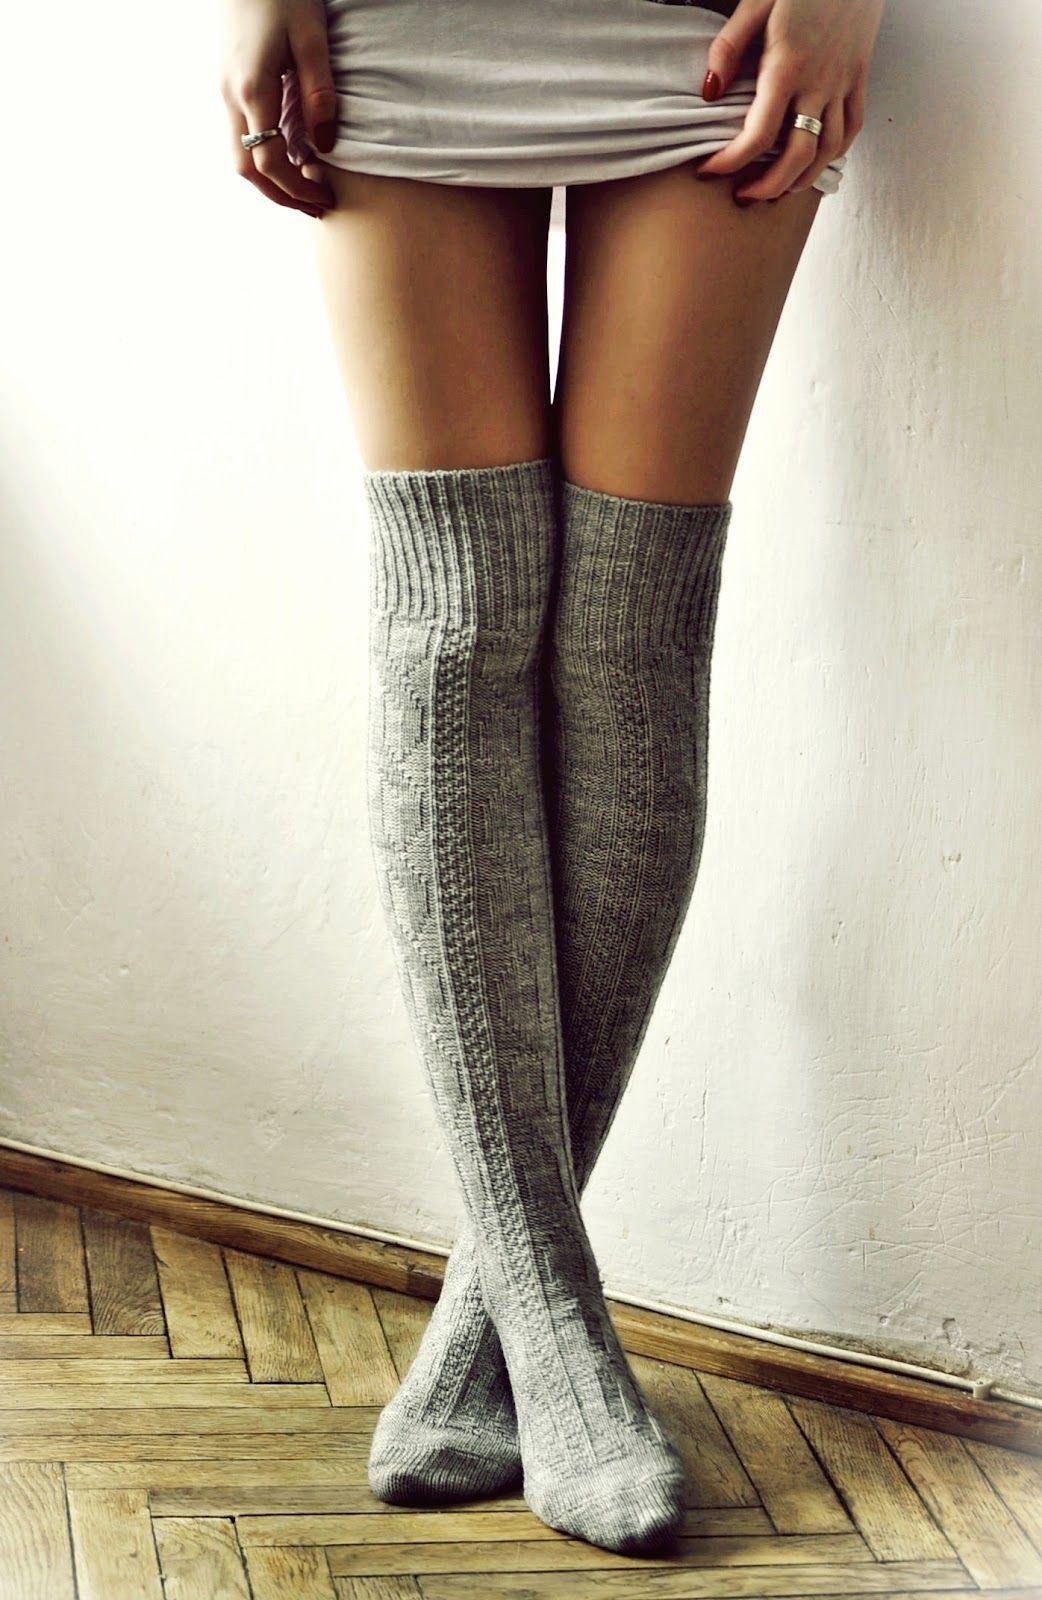 16f21e6f2 Over-the-knee socks.